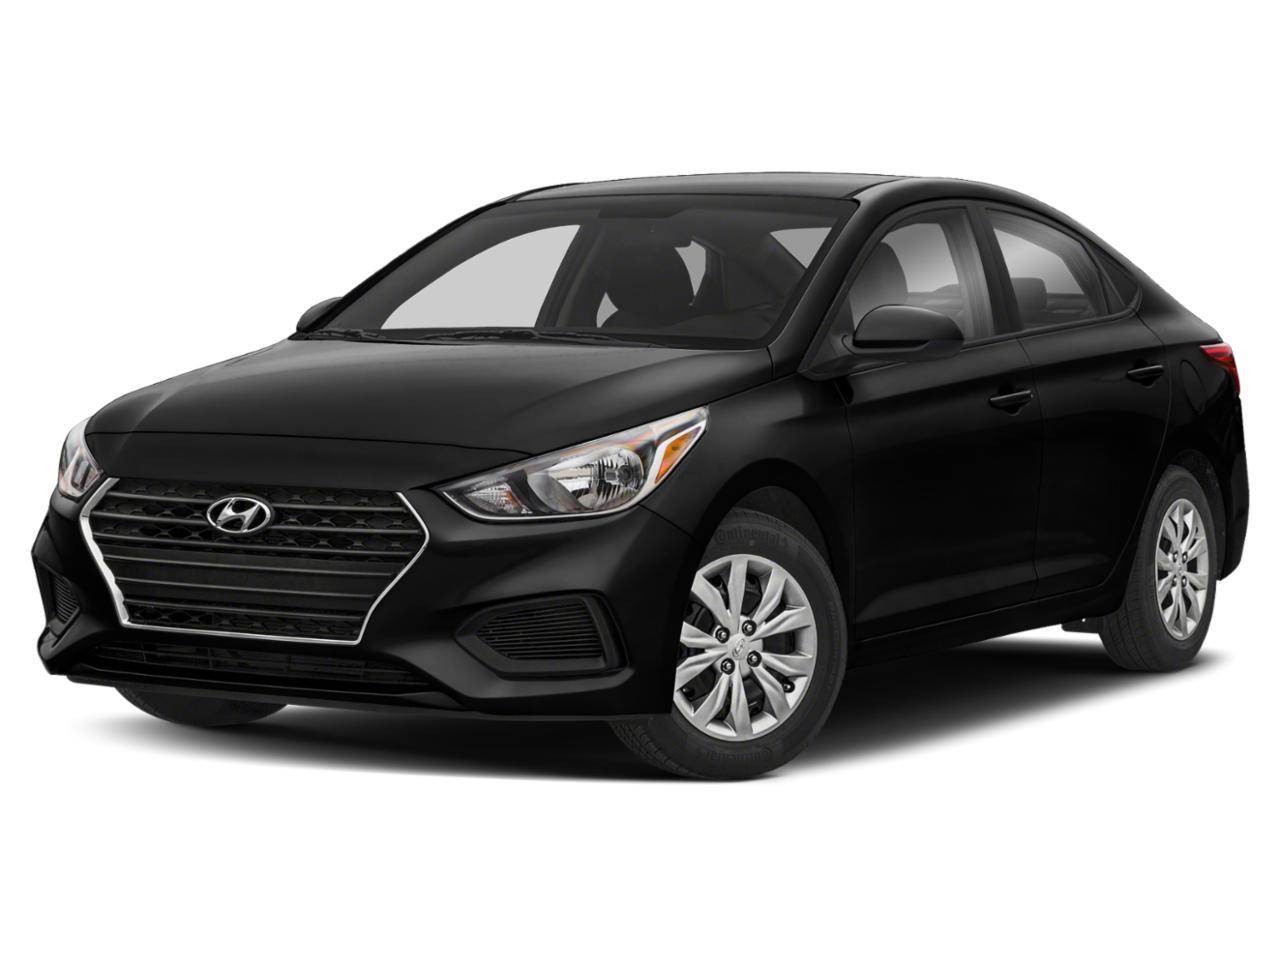 2020 Hyundai Accent Vehicle Photo in Merrillville, IN 46410